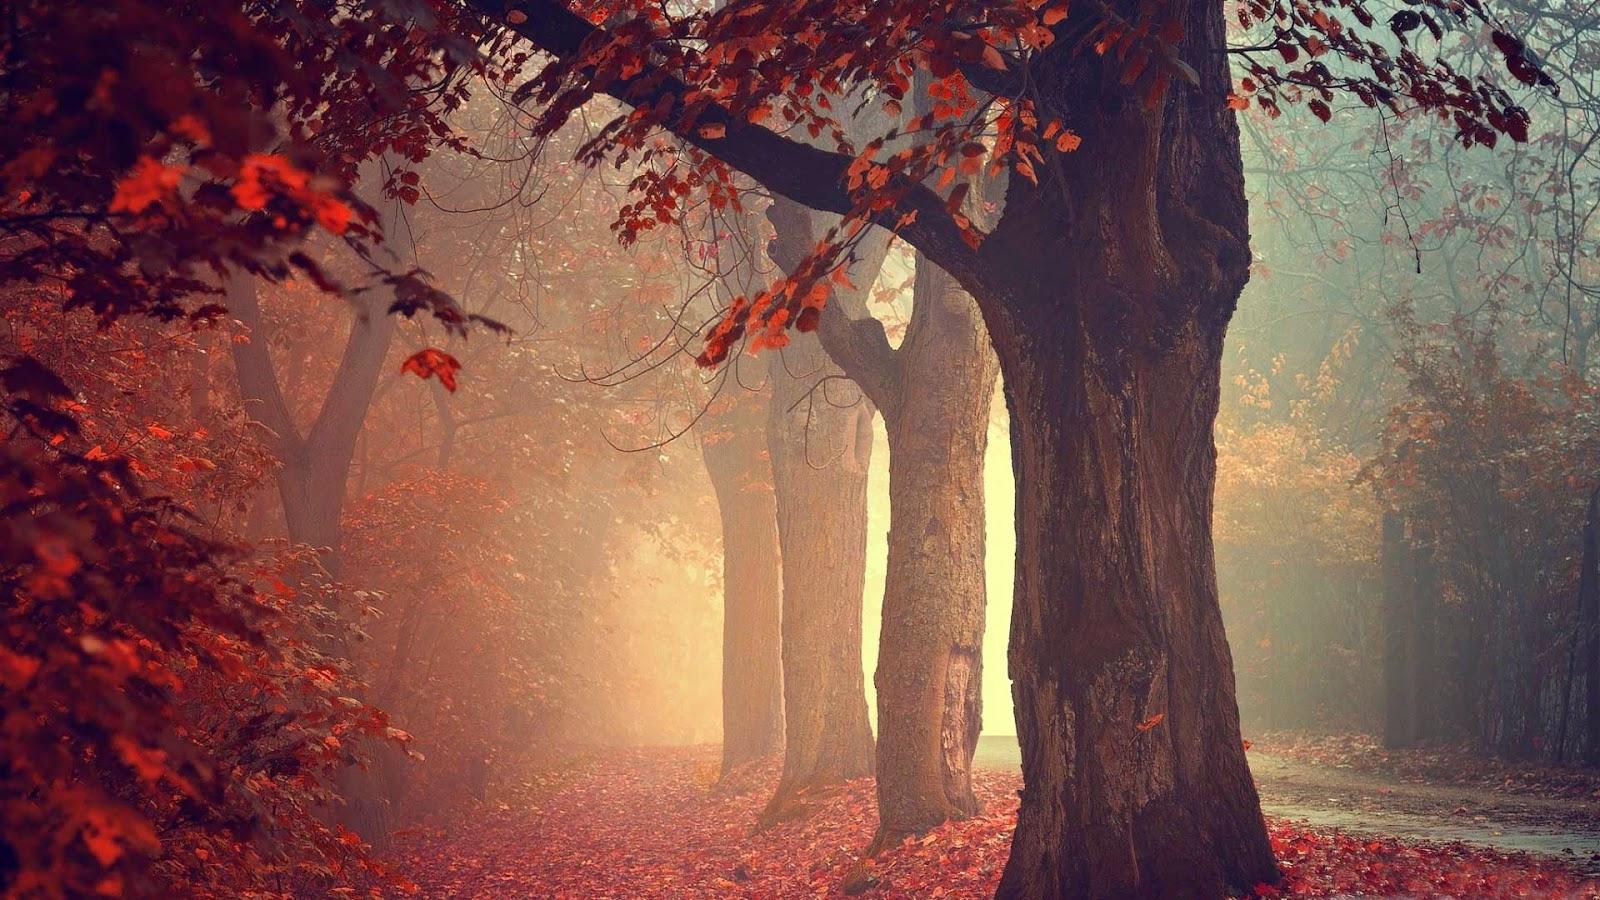 Papel de Parede Natureza Outono nature wallpaper hd image